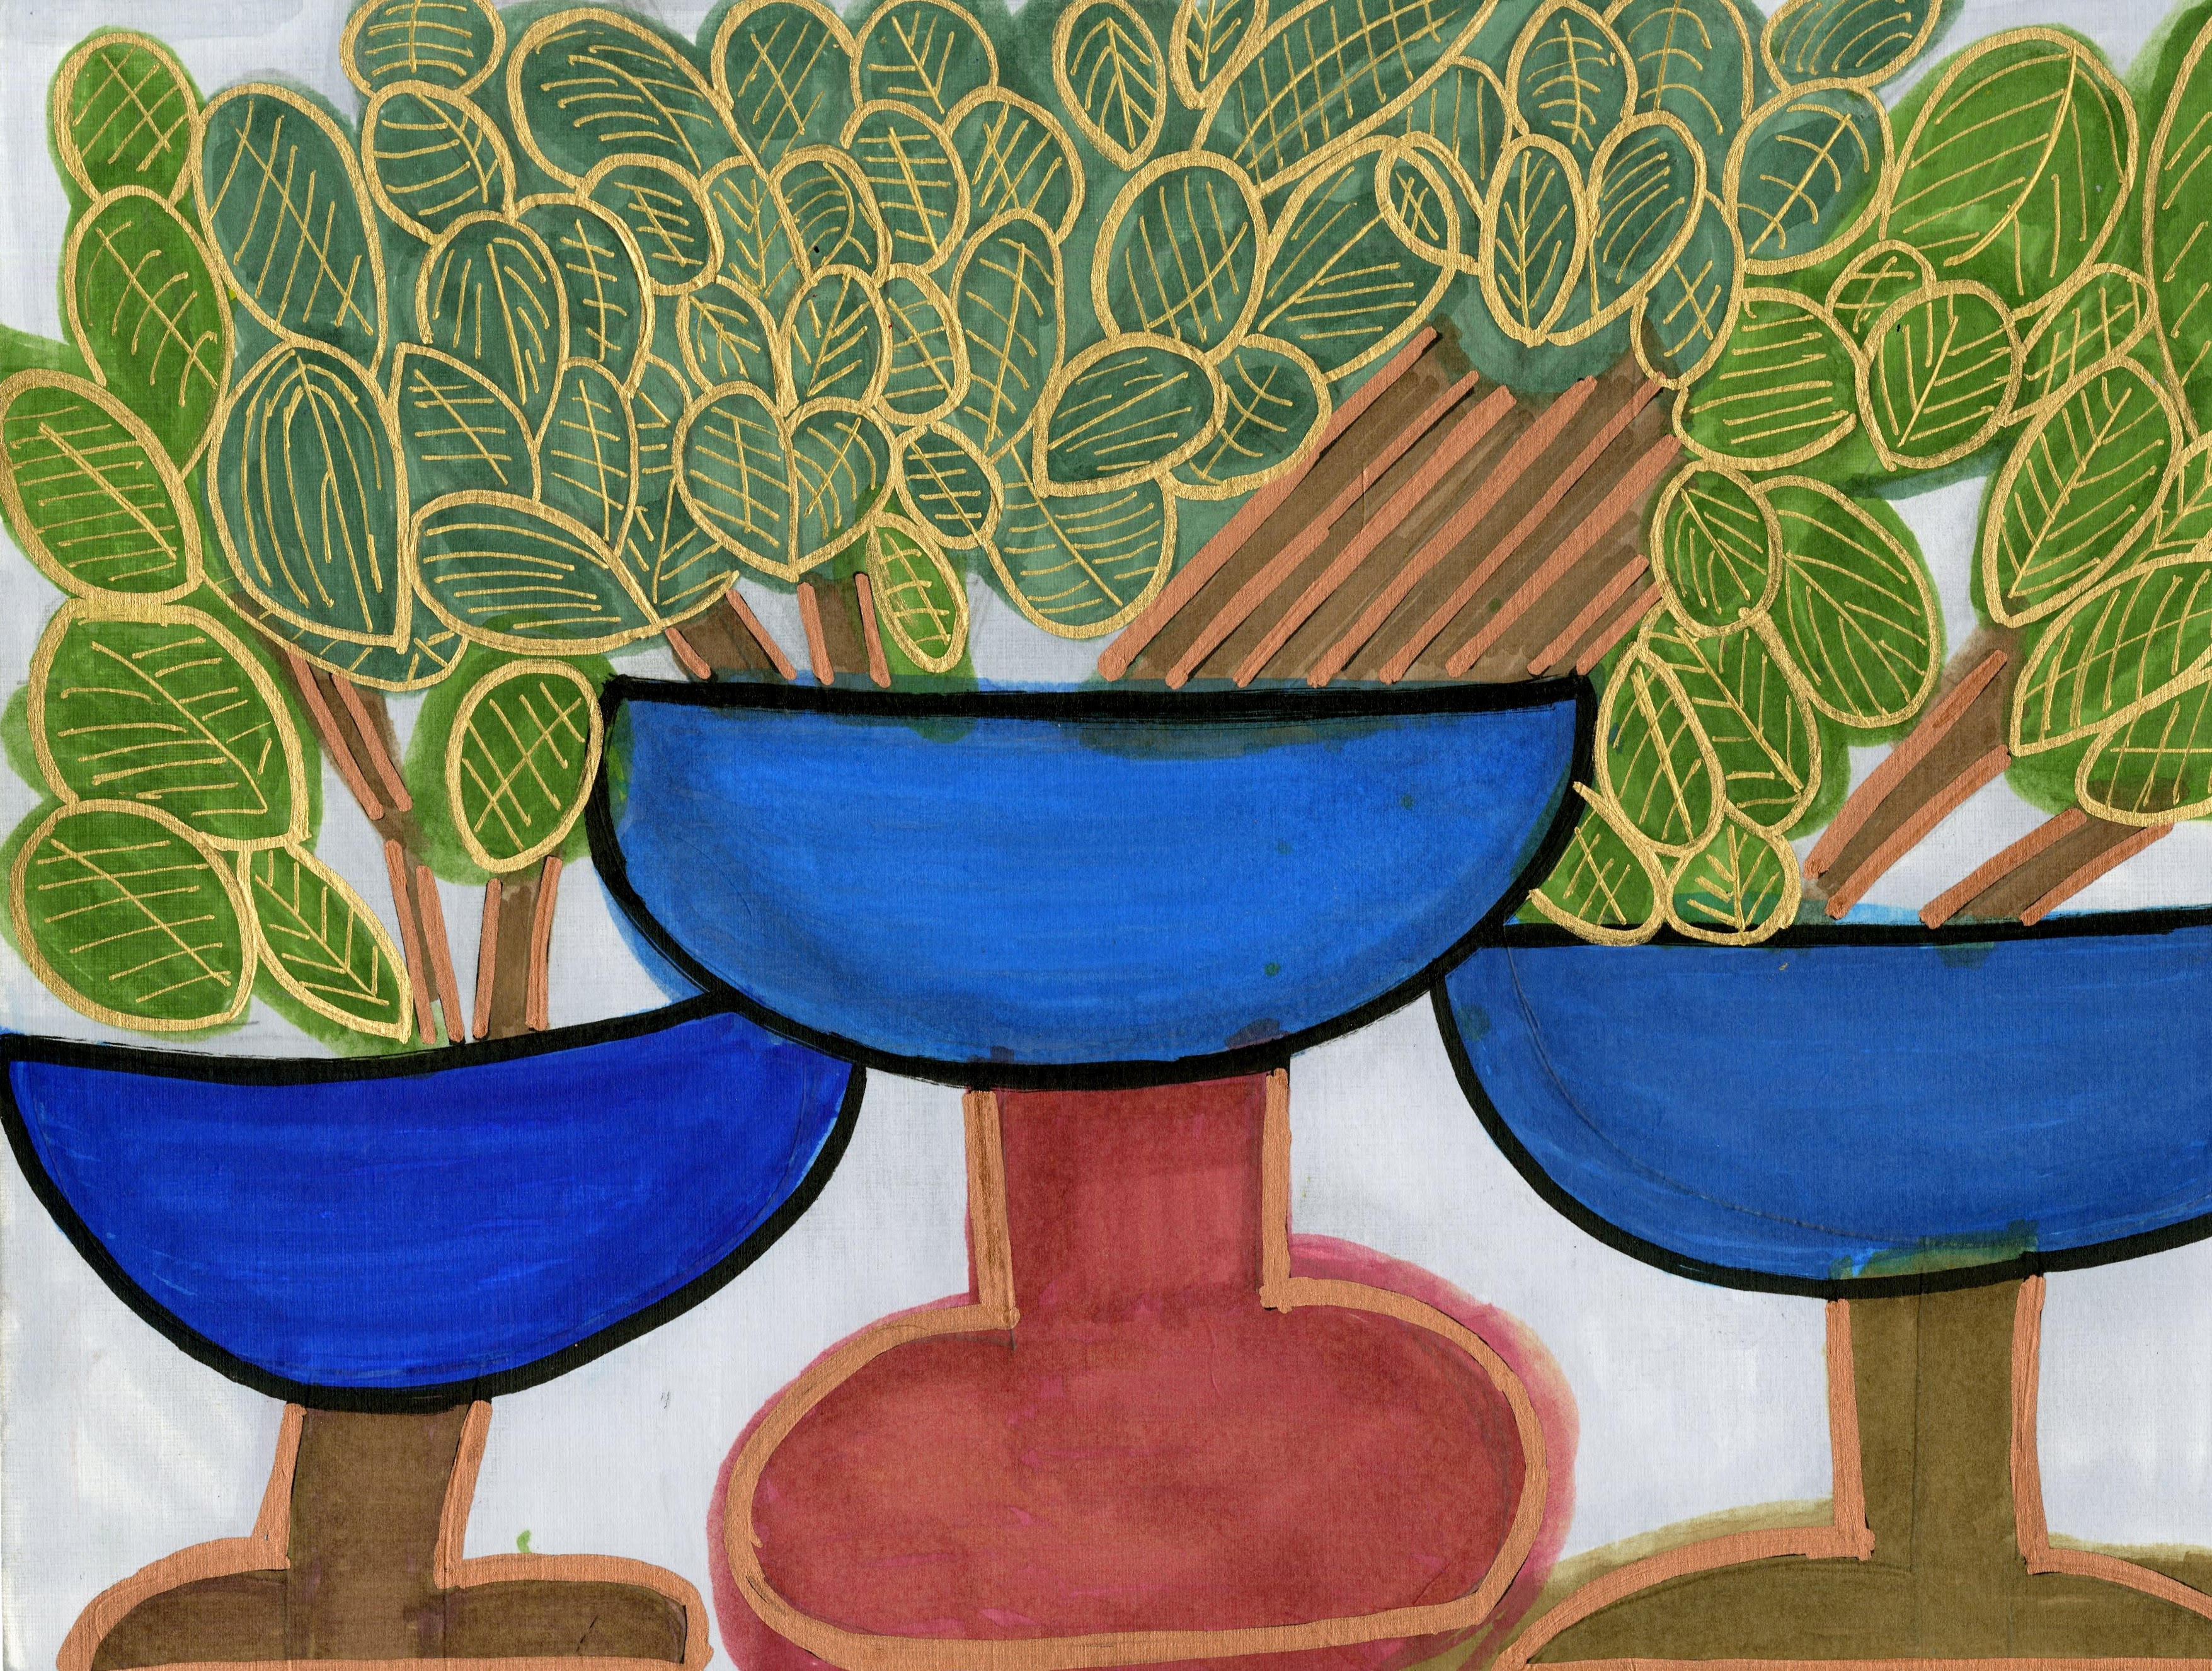 """The Leaves"" by Safiya Hameed"